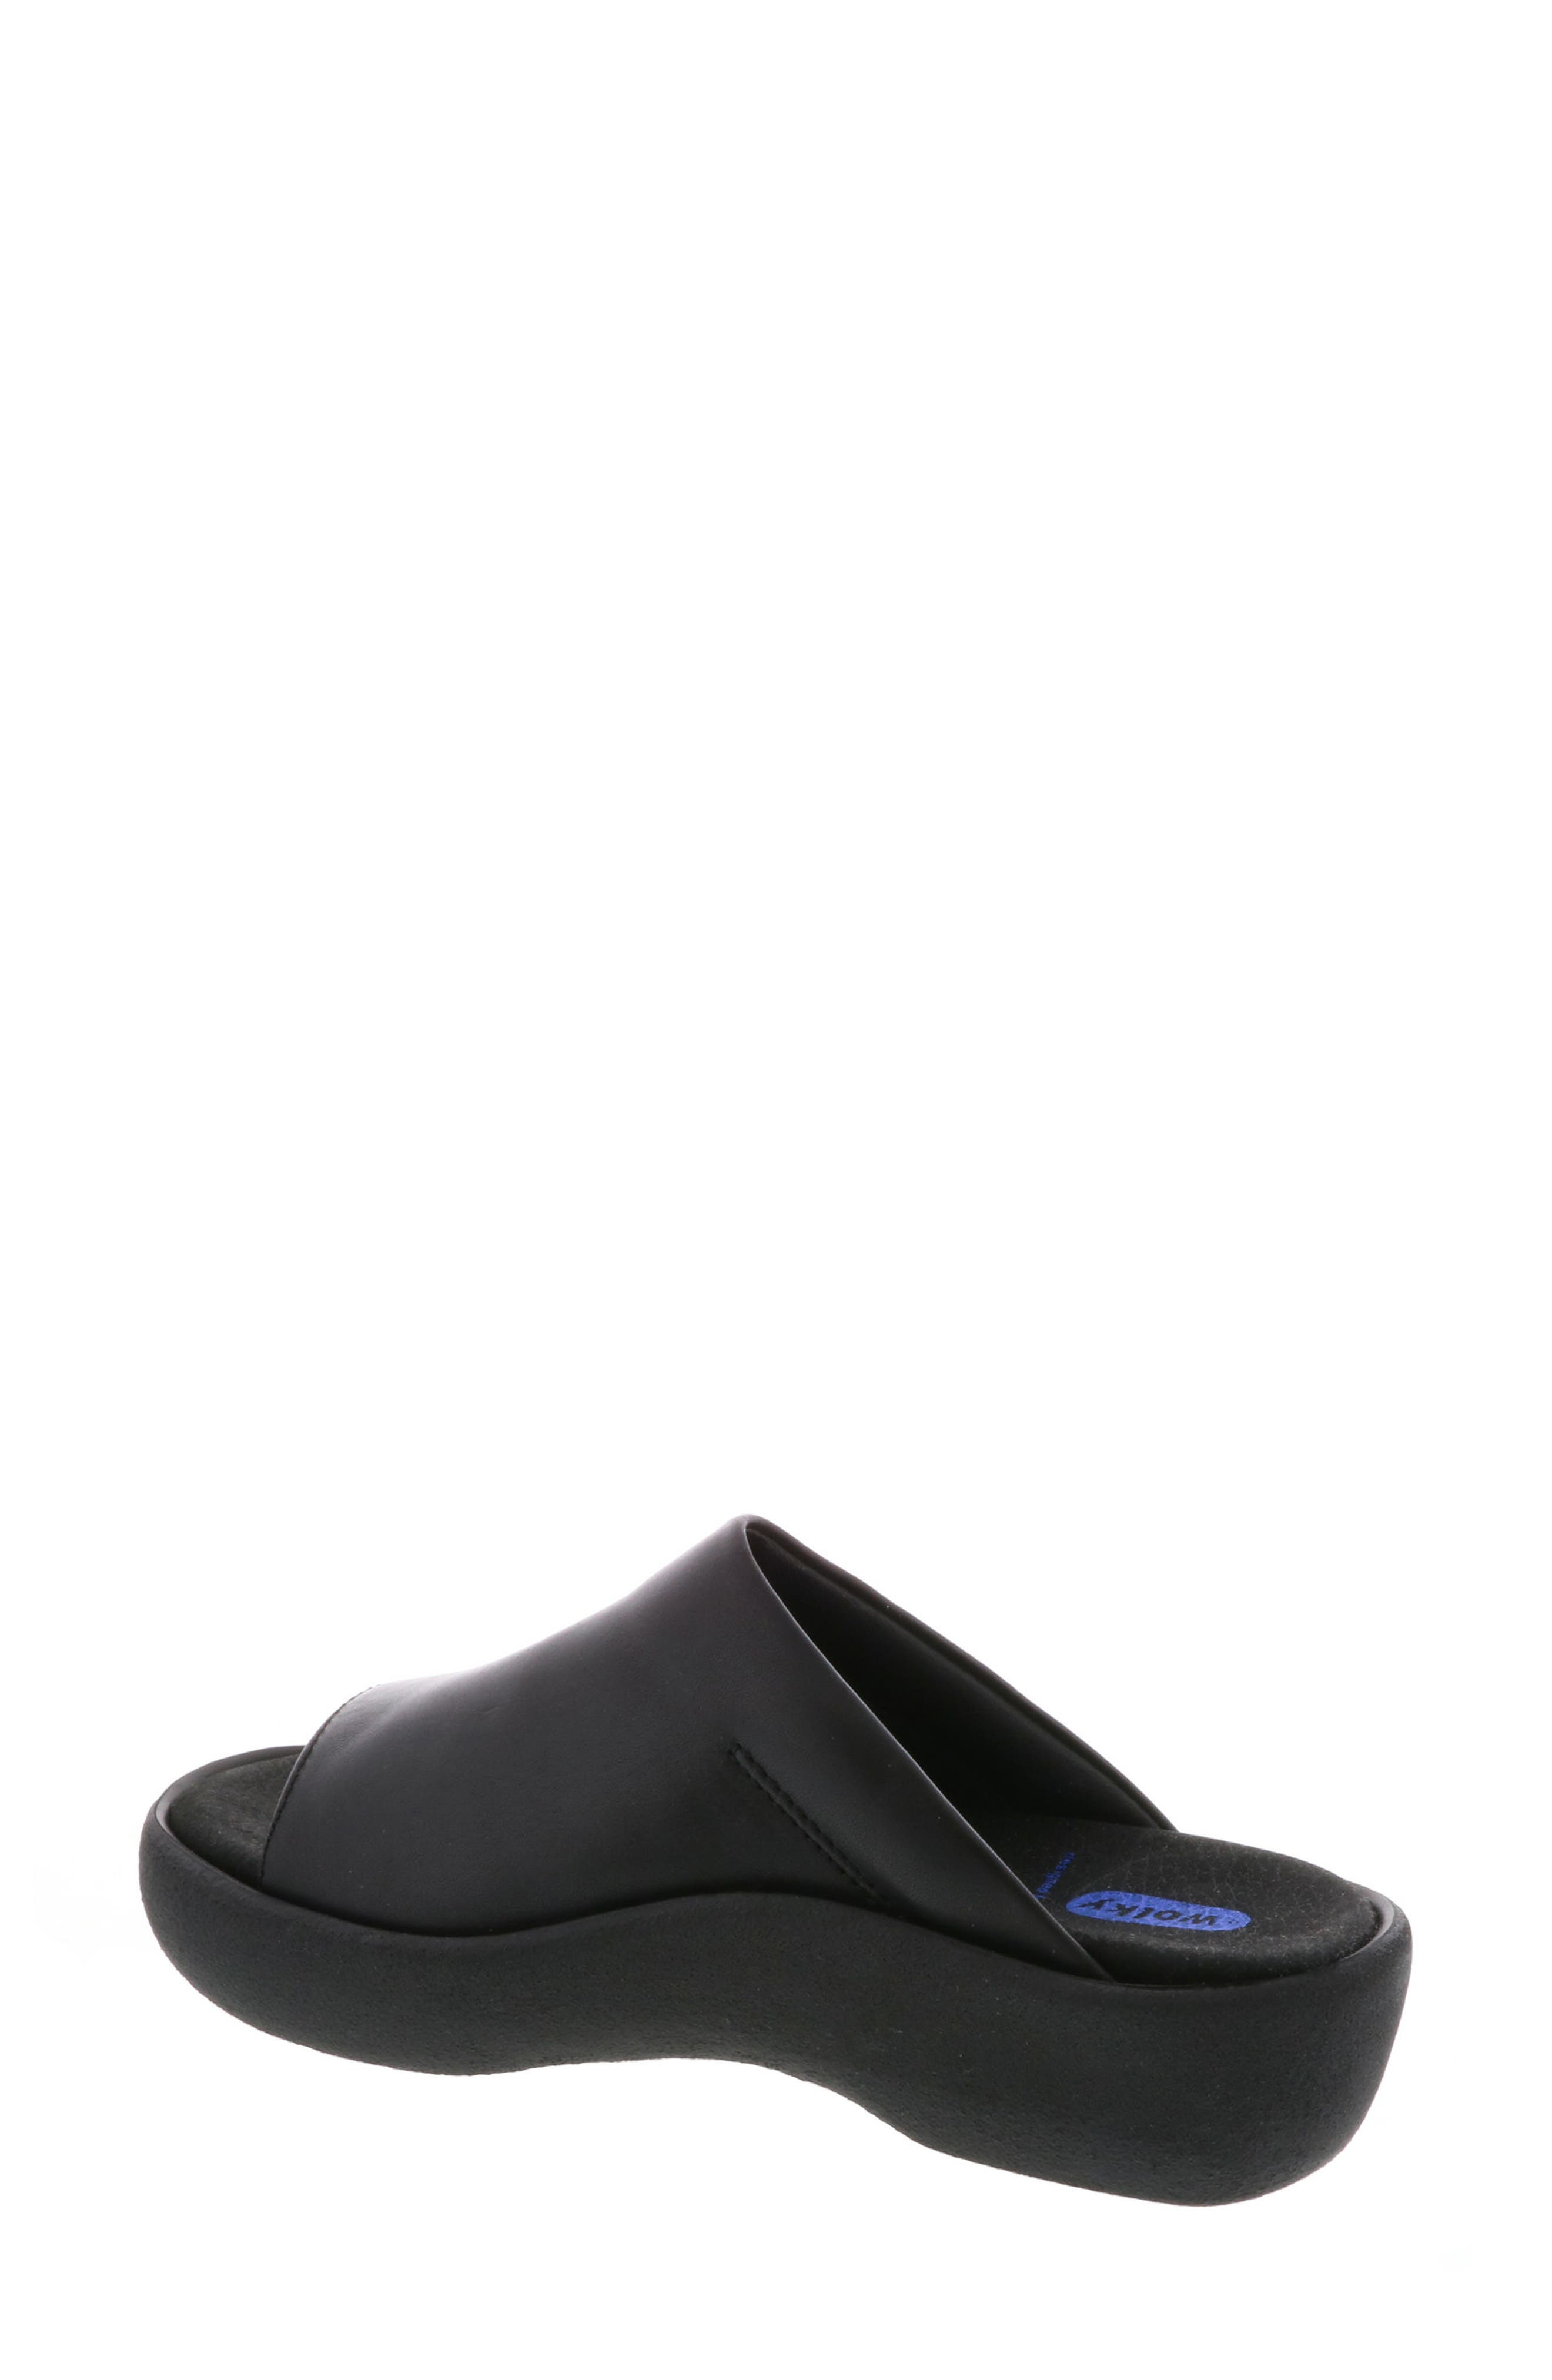 Nassau Slide Sandal,                             Alternate thumbnail 2, color,                             BLACK SMOOTH LEATHER